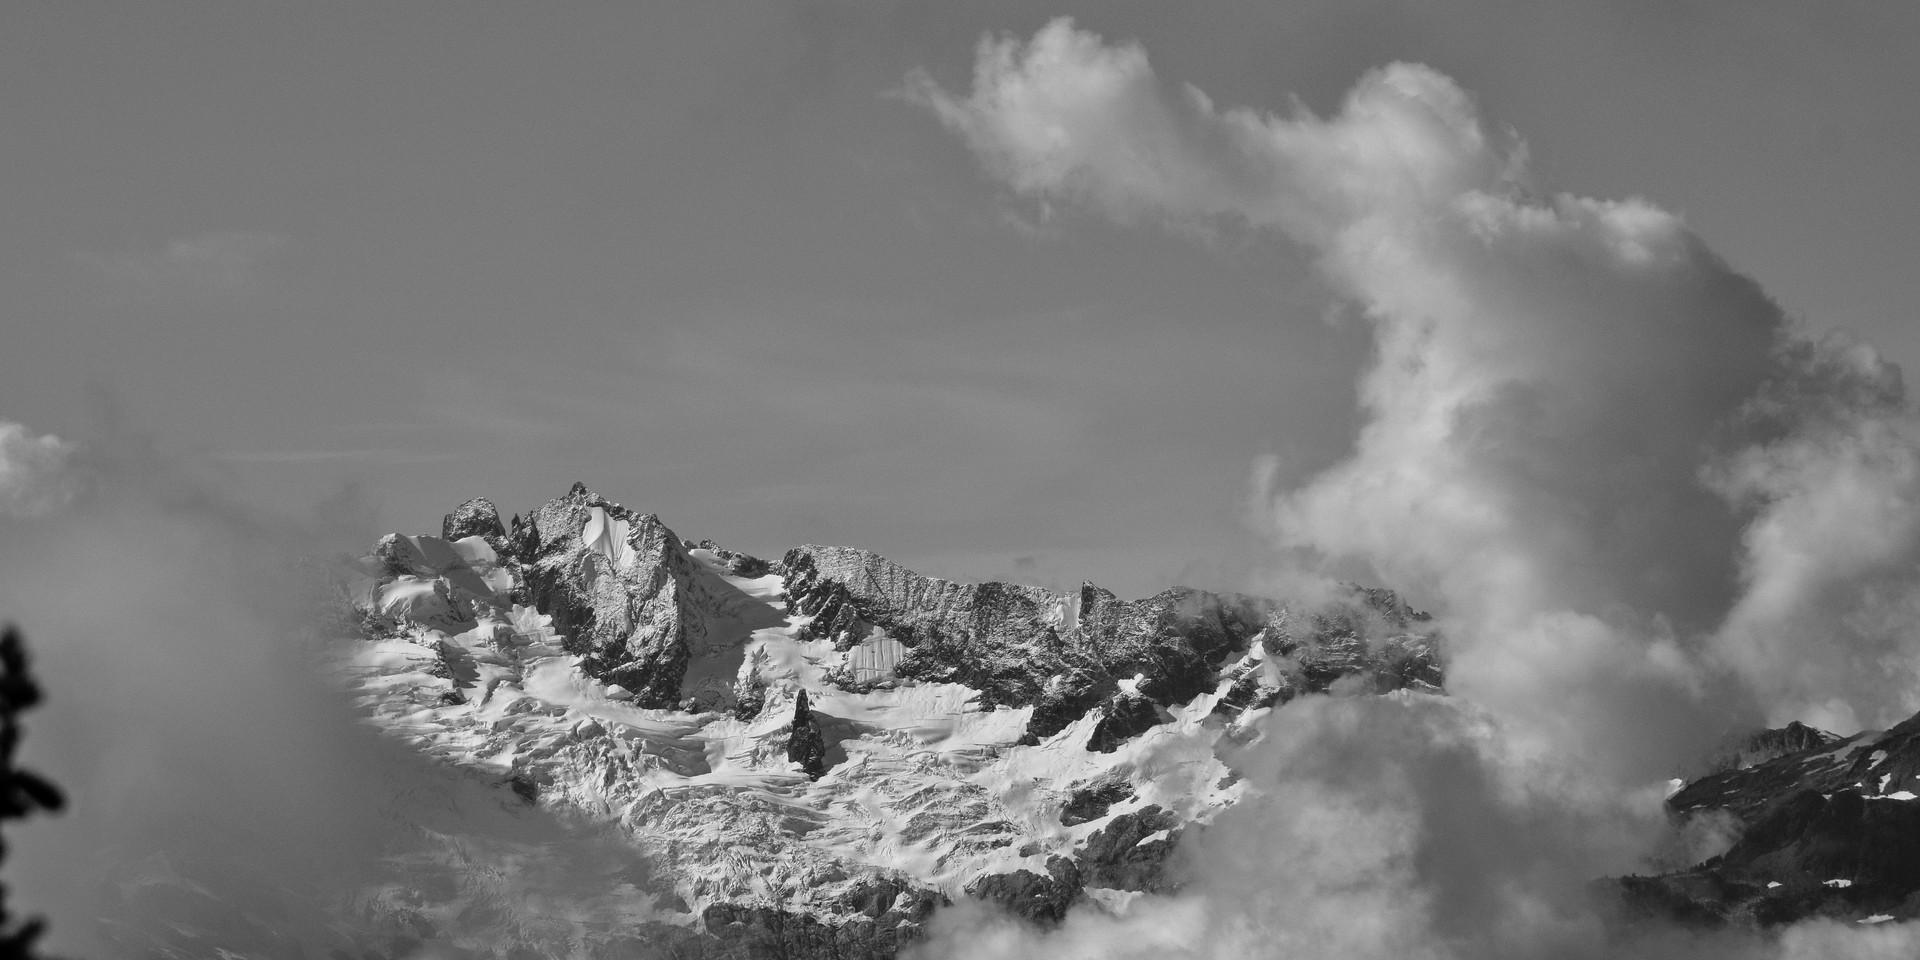 Mt. Tanatlus through the storm